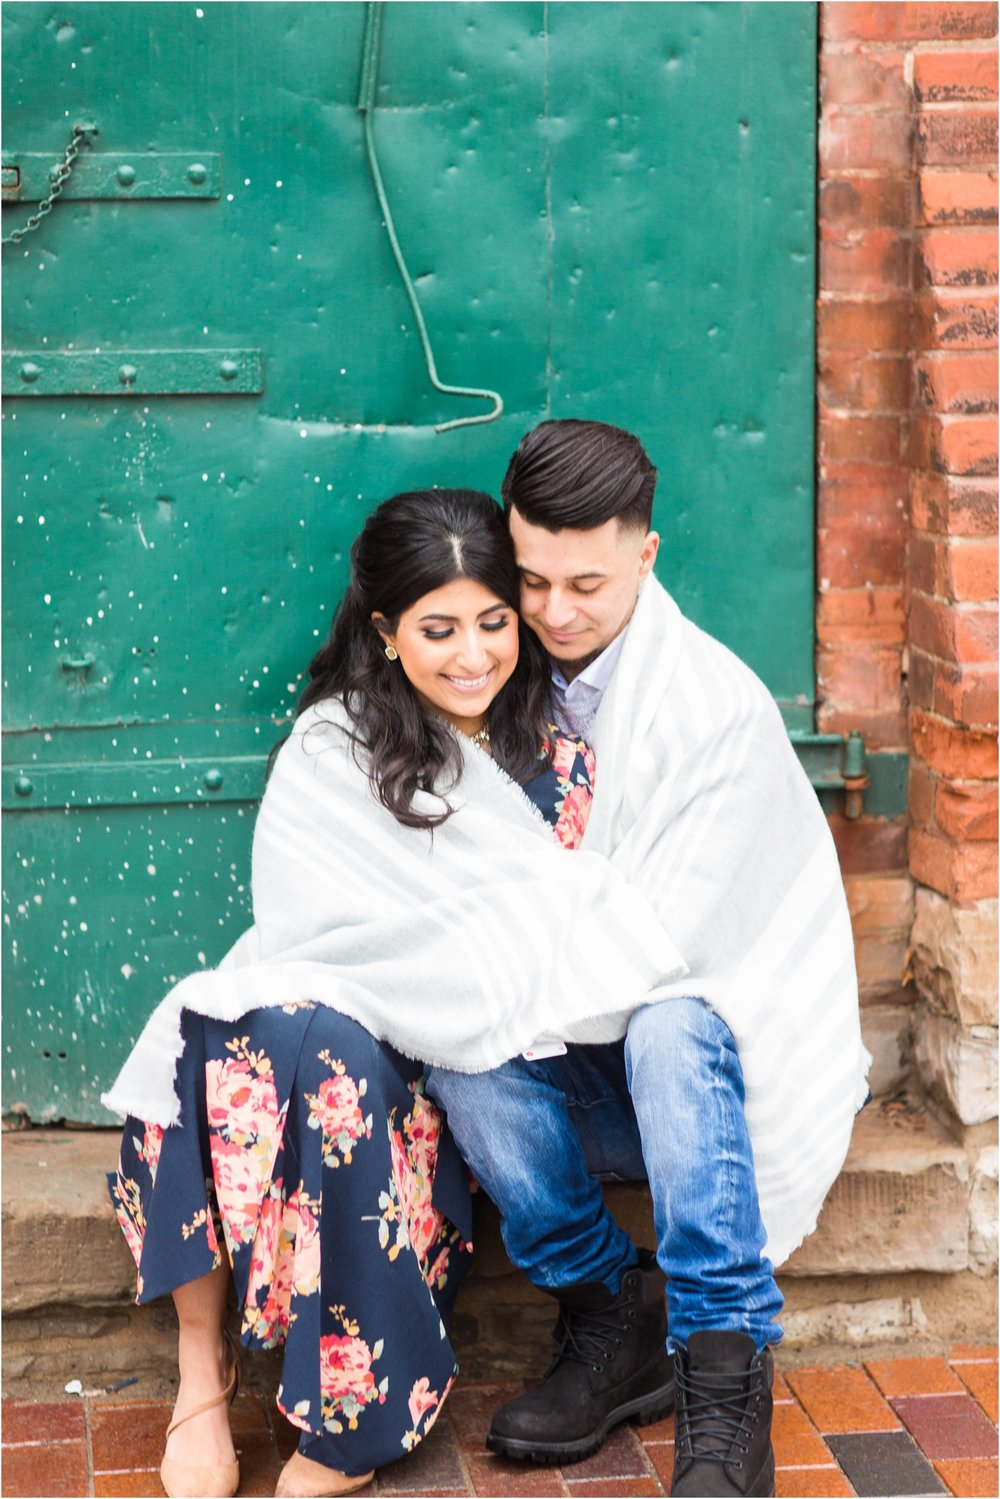 Knox-College-U-of-T-University-of-Toronto-Distillery-District-Engagement-Session-Toronto-Mississauga-Brampton-Scarborough-GTA-Pakistani-Indian-Wedding-Engagement-Photographer-Photography_0044.jpg